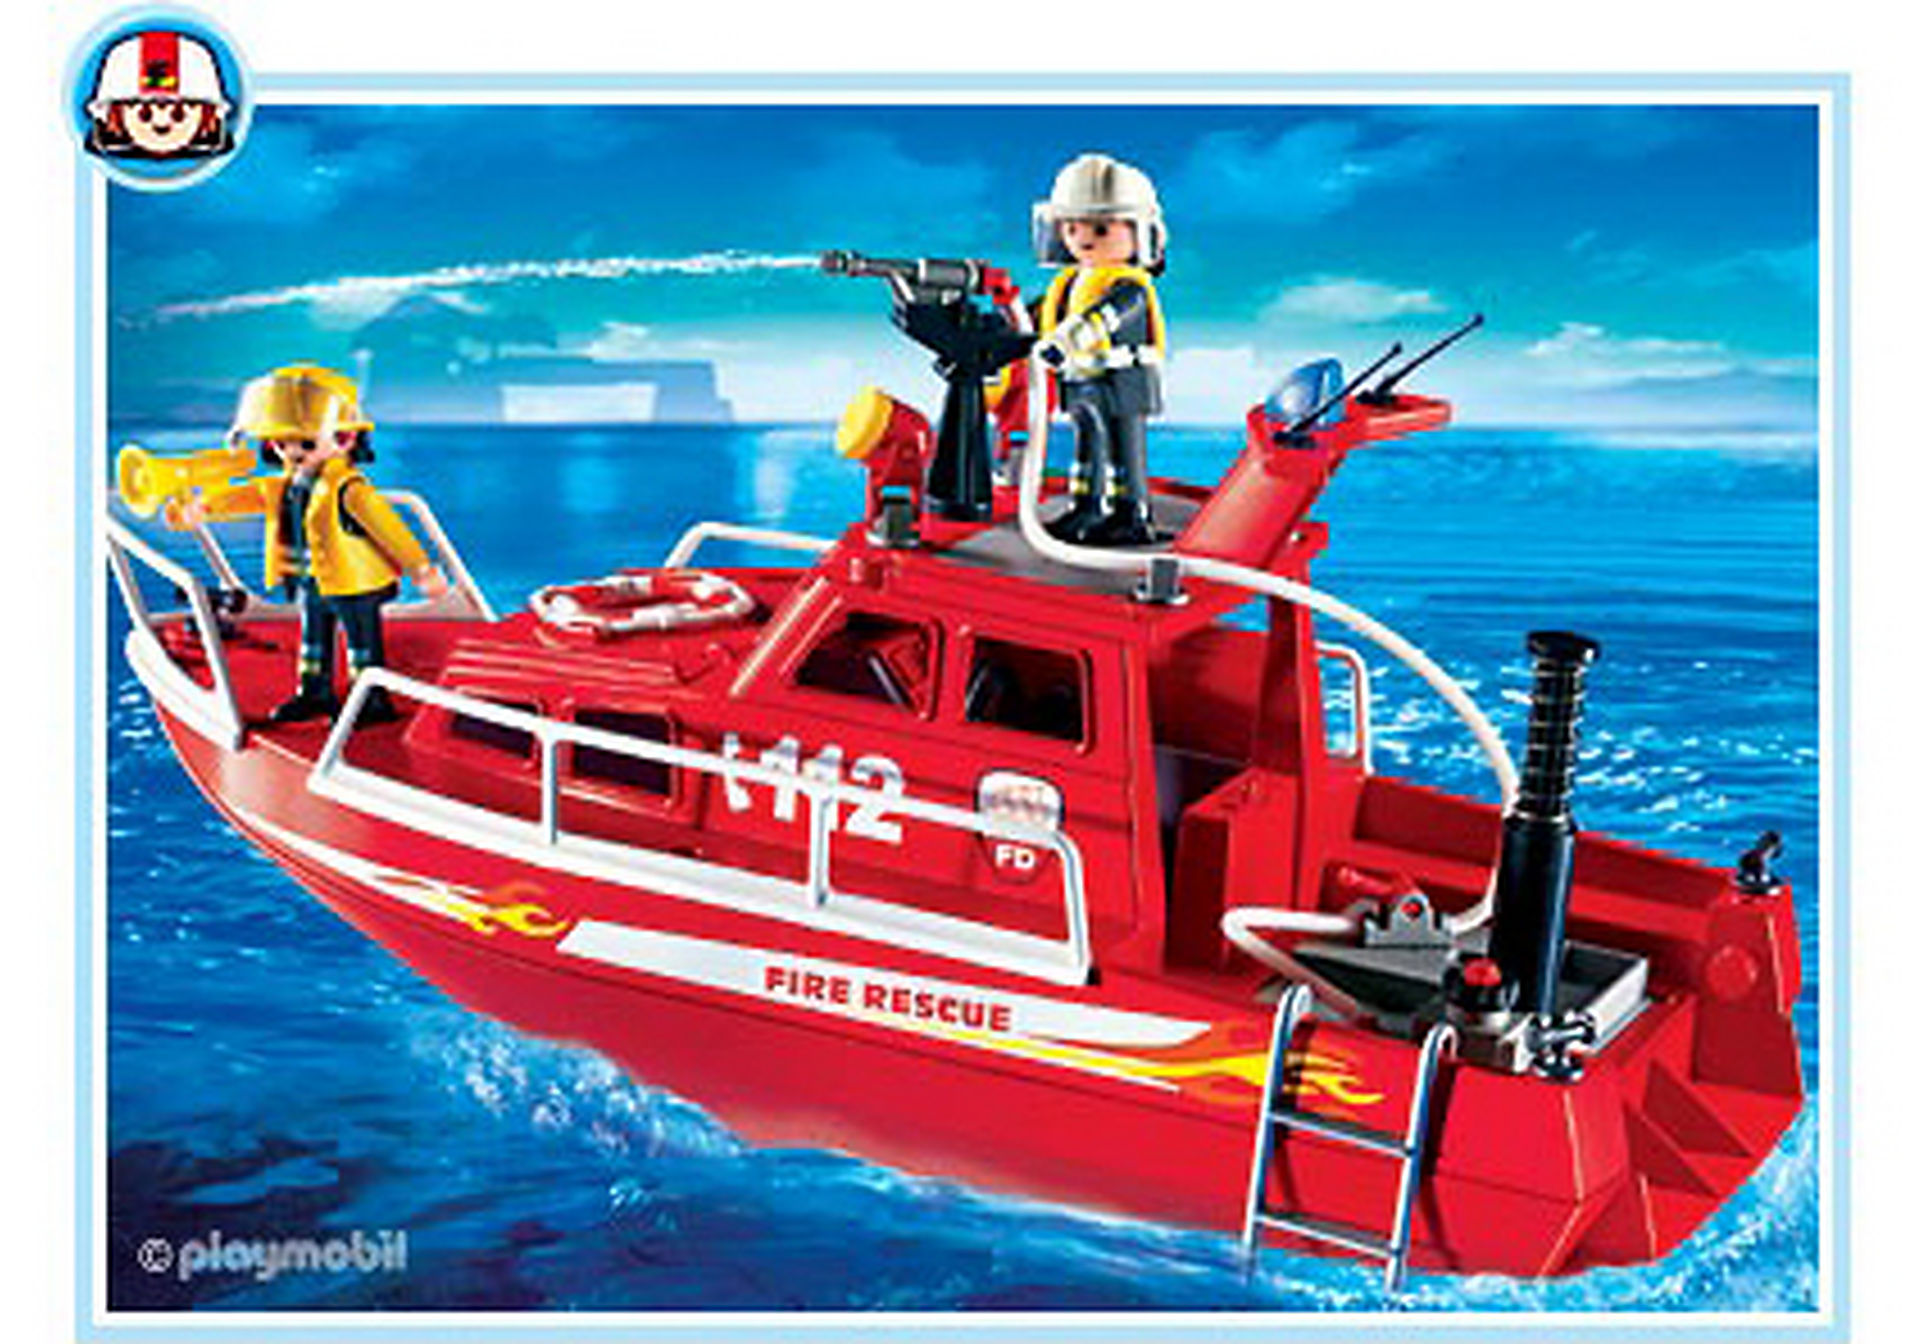 http://media.playmobil.com/i/playmobil/3128-B_product_detail/Pompiers / sauveteurs bateau